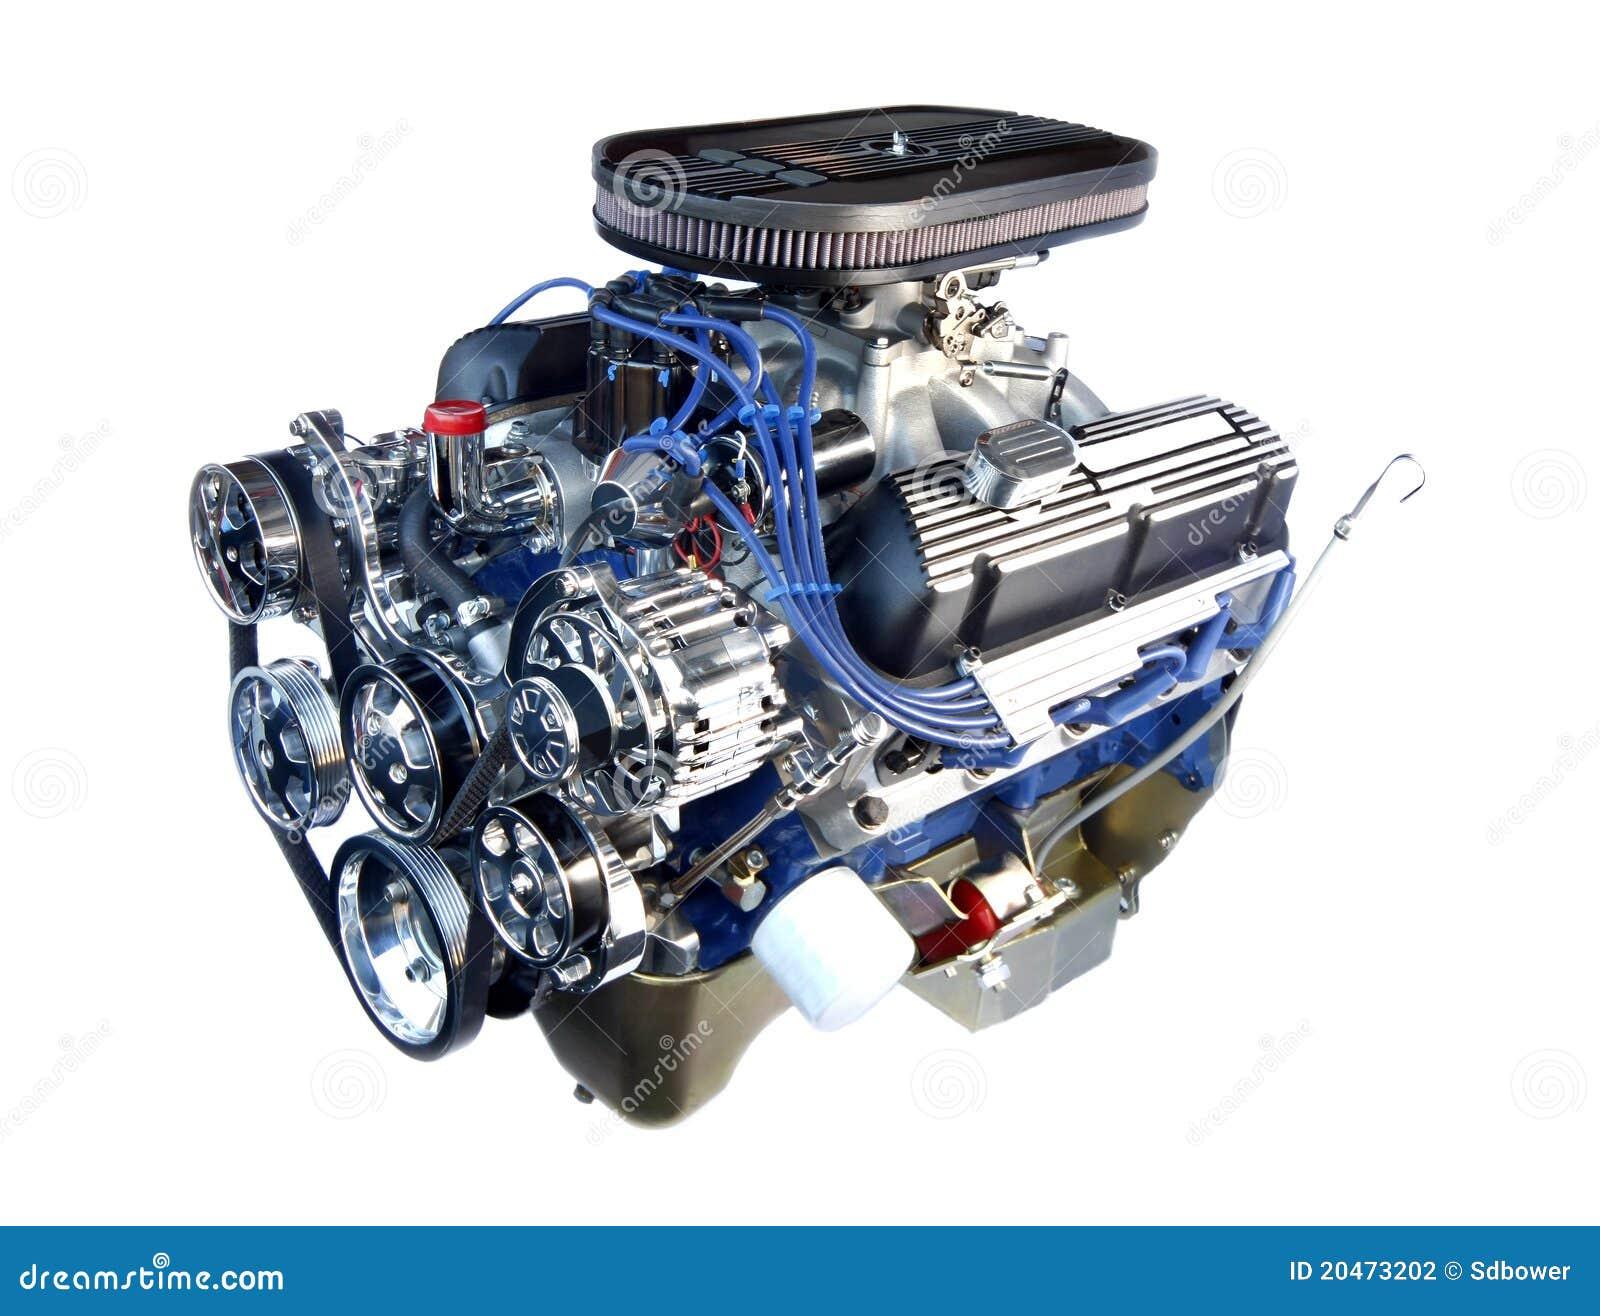 Hochleistungs Chromv8 Motor Getrennt Stockfotografie